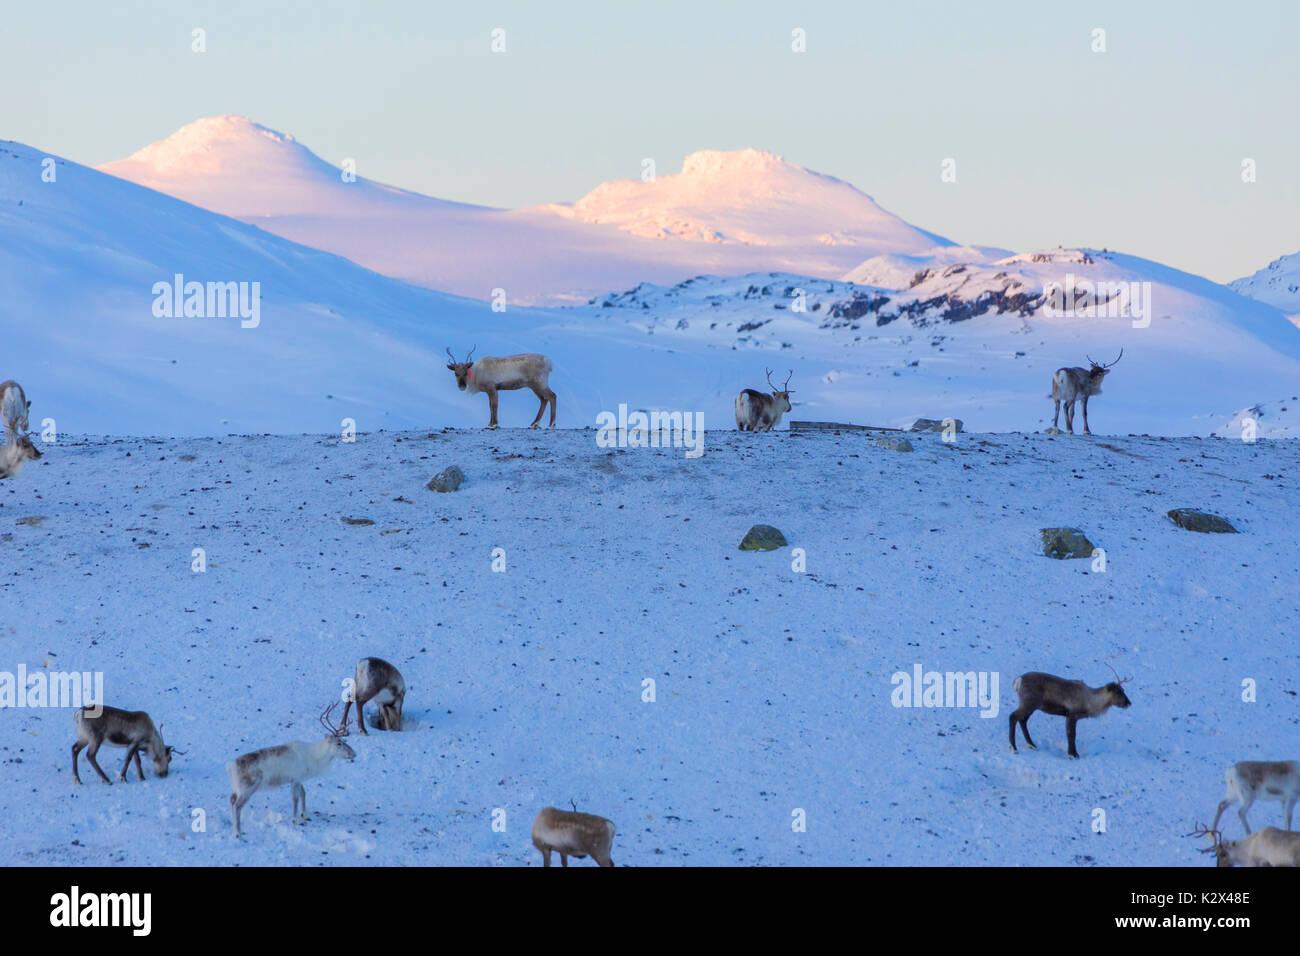 Reindeer in the snow, Abisko, Kiruna Municipality, Norrbotten County, Lapland, Sweden - Stock Image